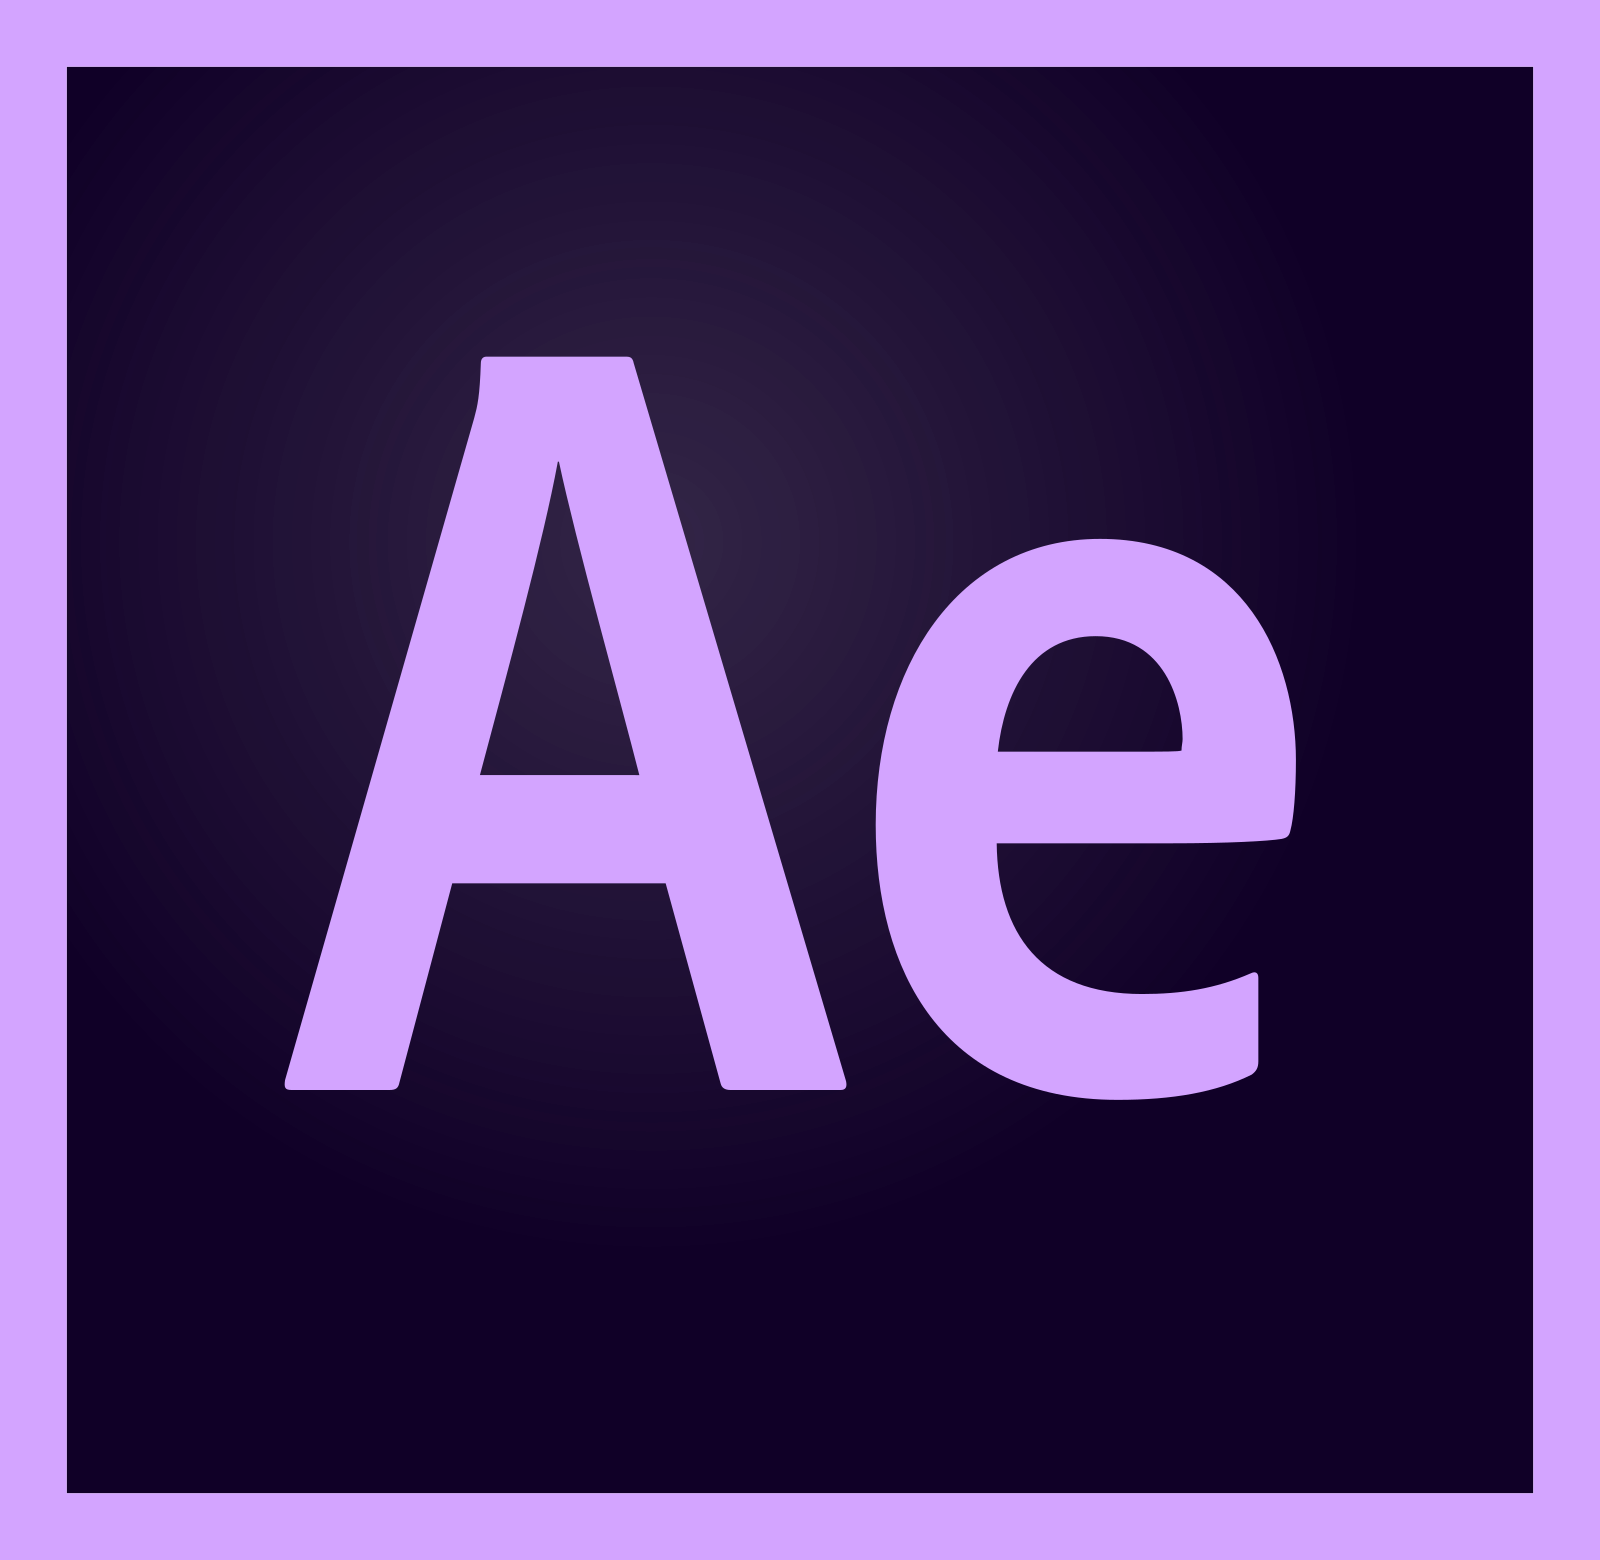 adobe after effects logo 2 - Adobe After Effects Logo